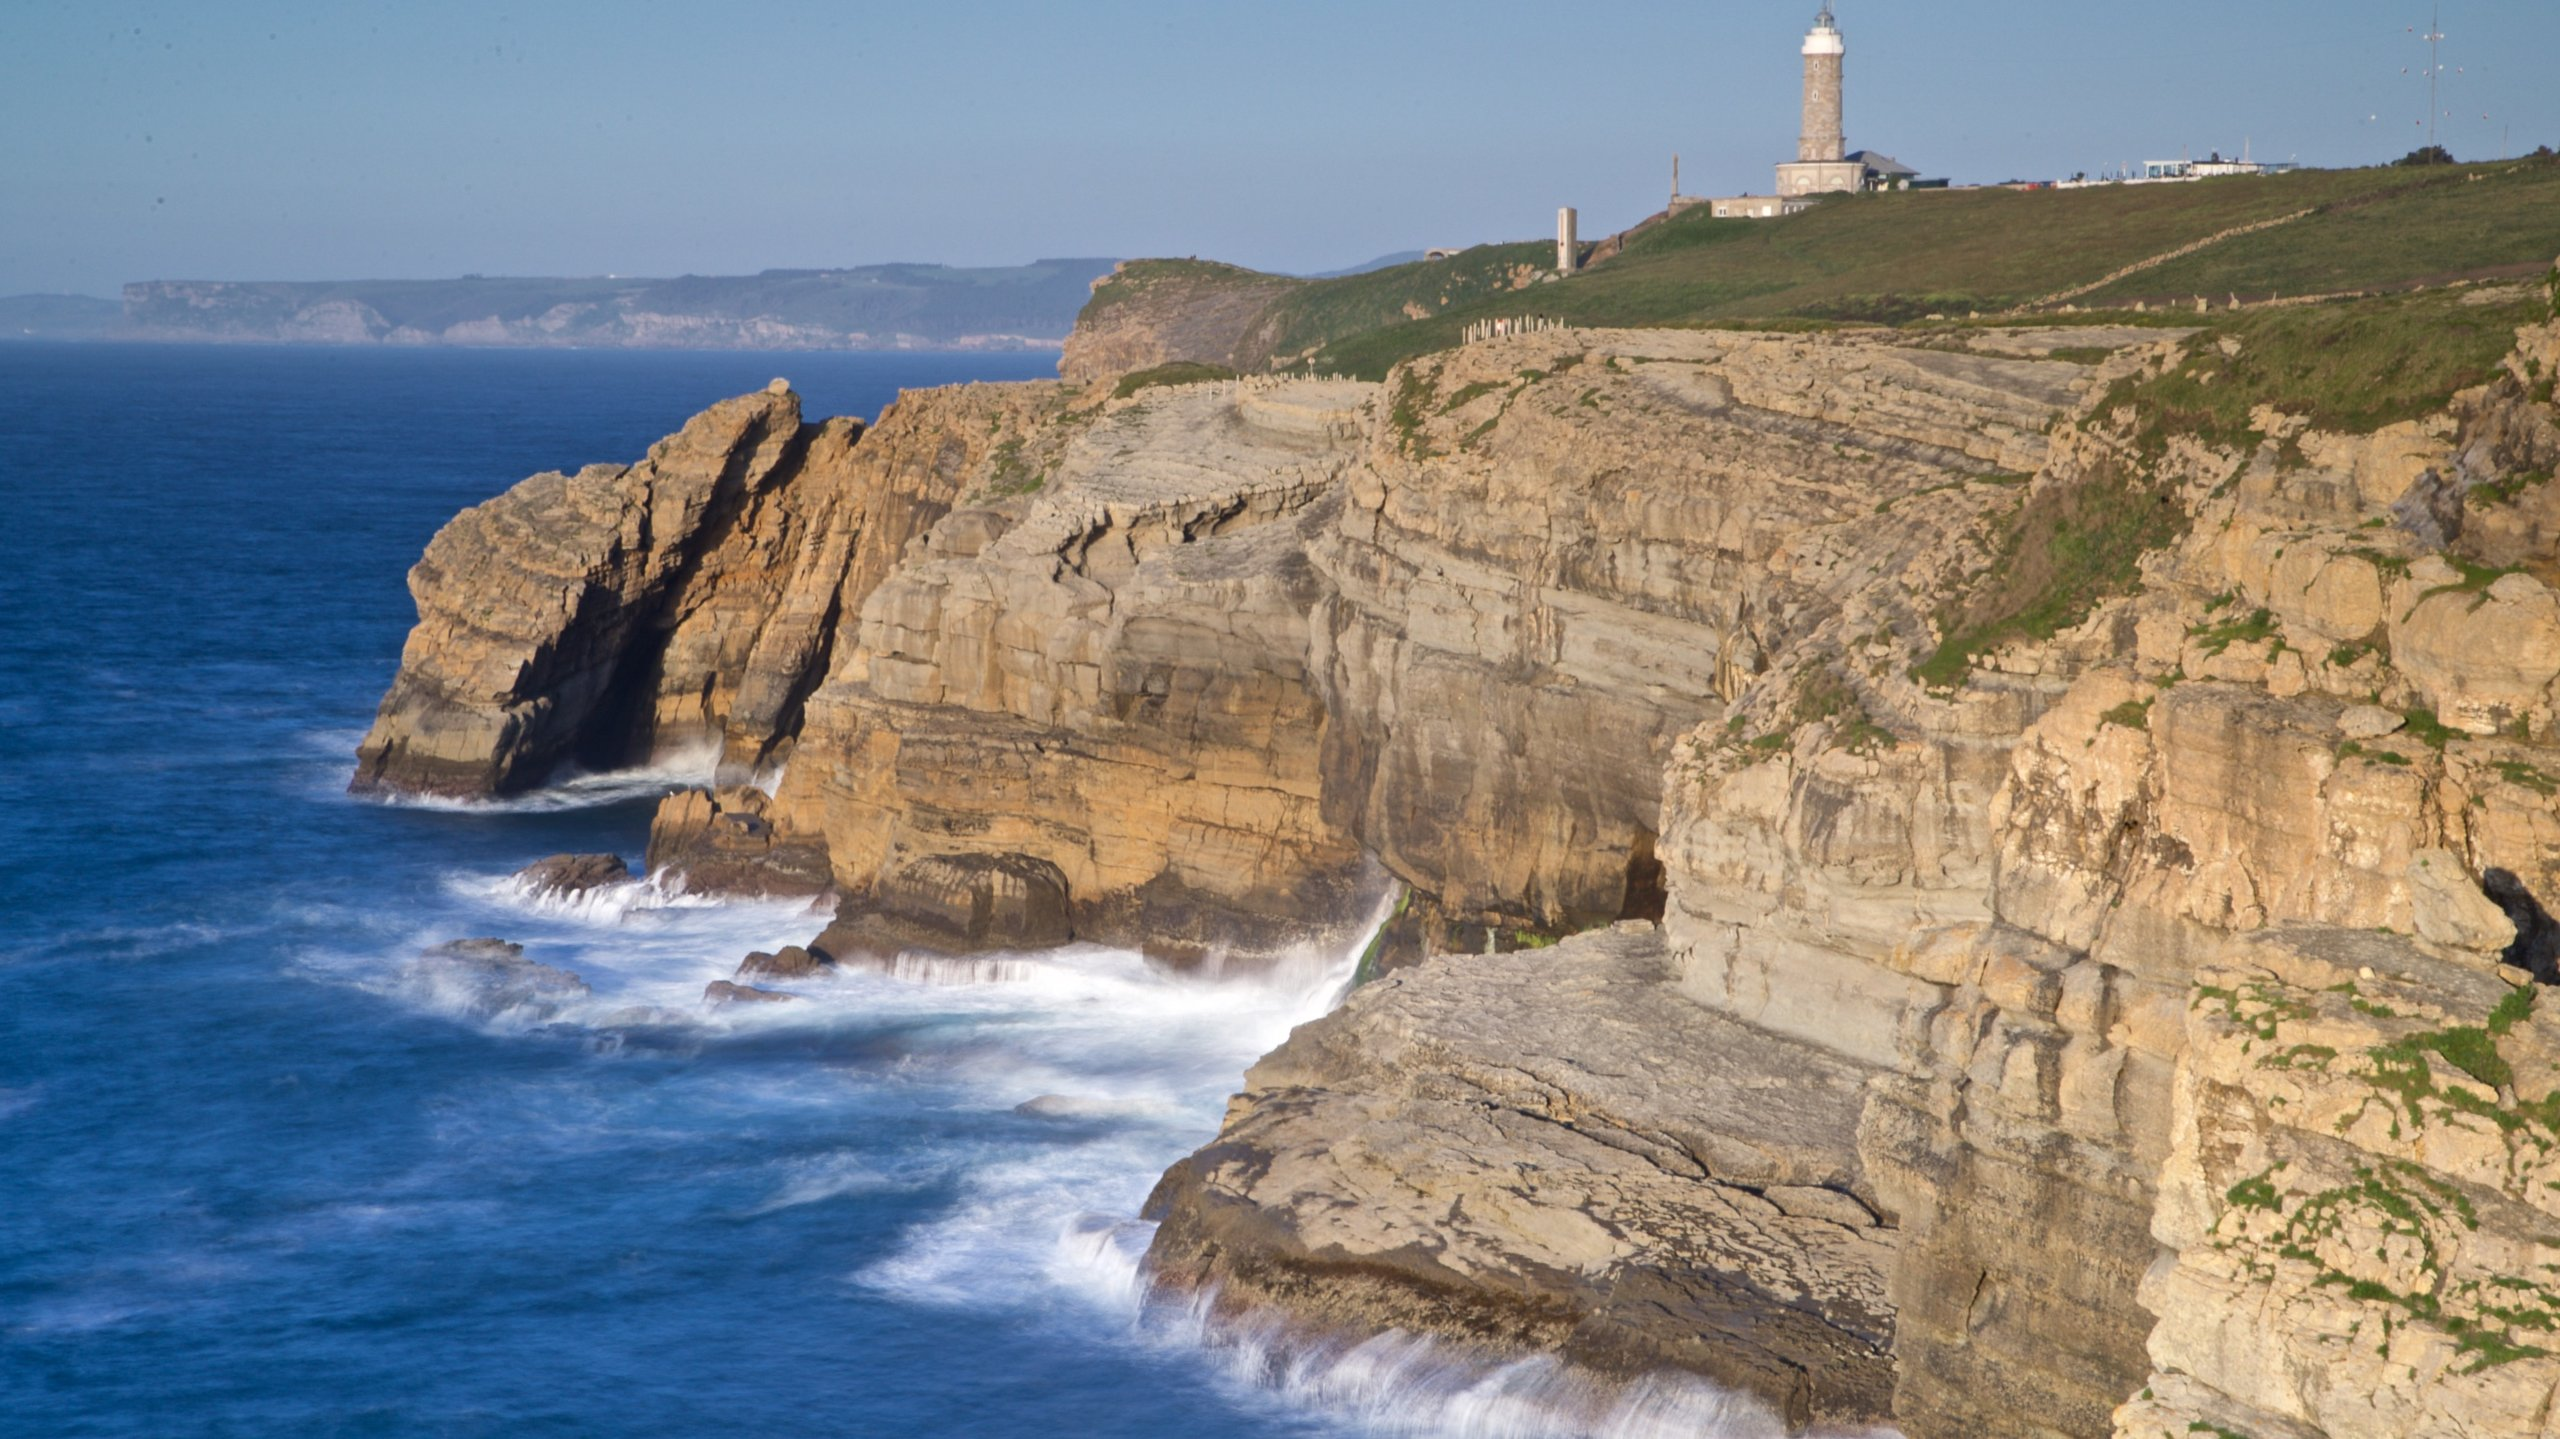 Cabo Mayor, Santander, Cantabria, Spain